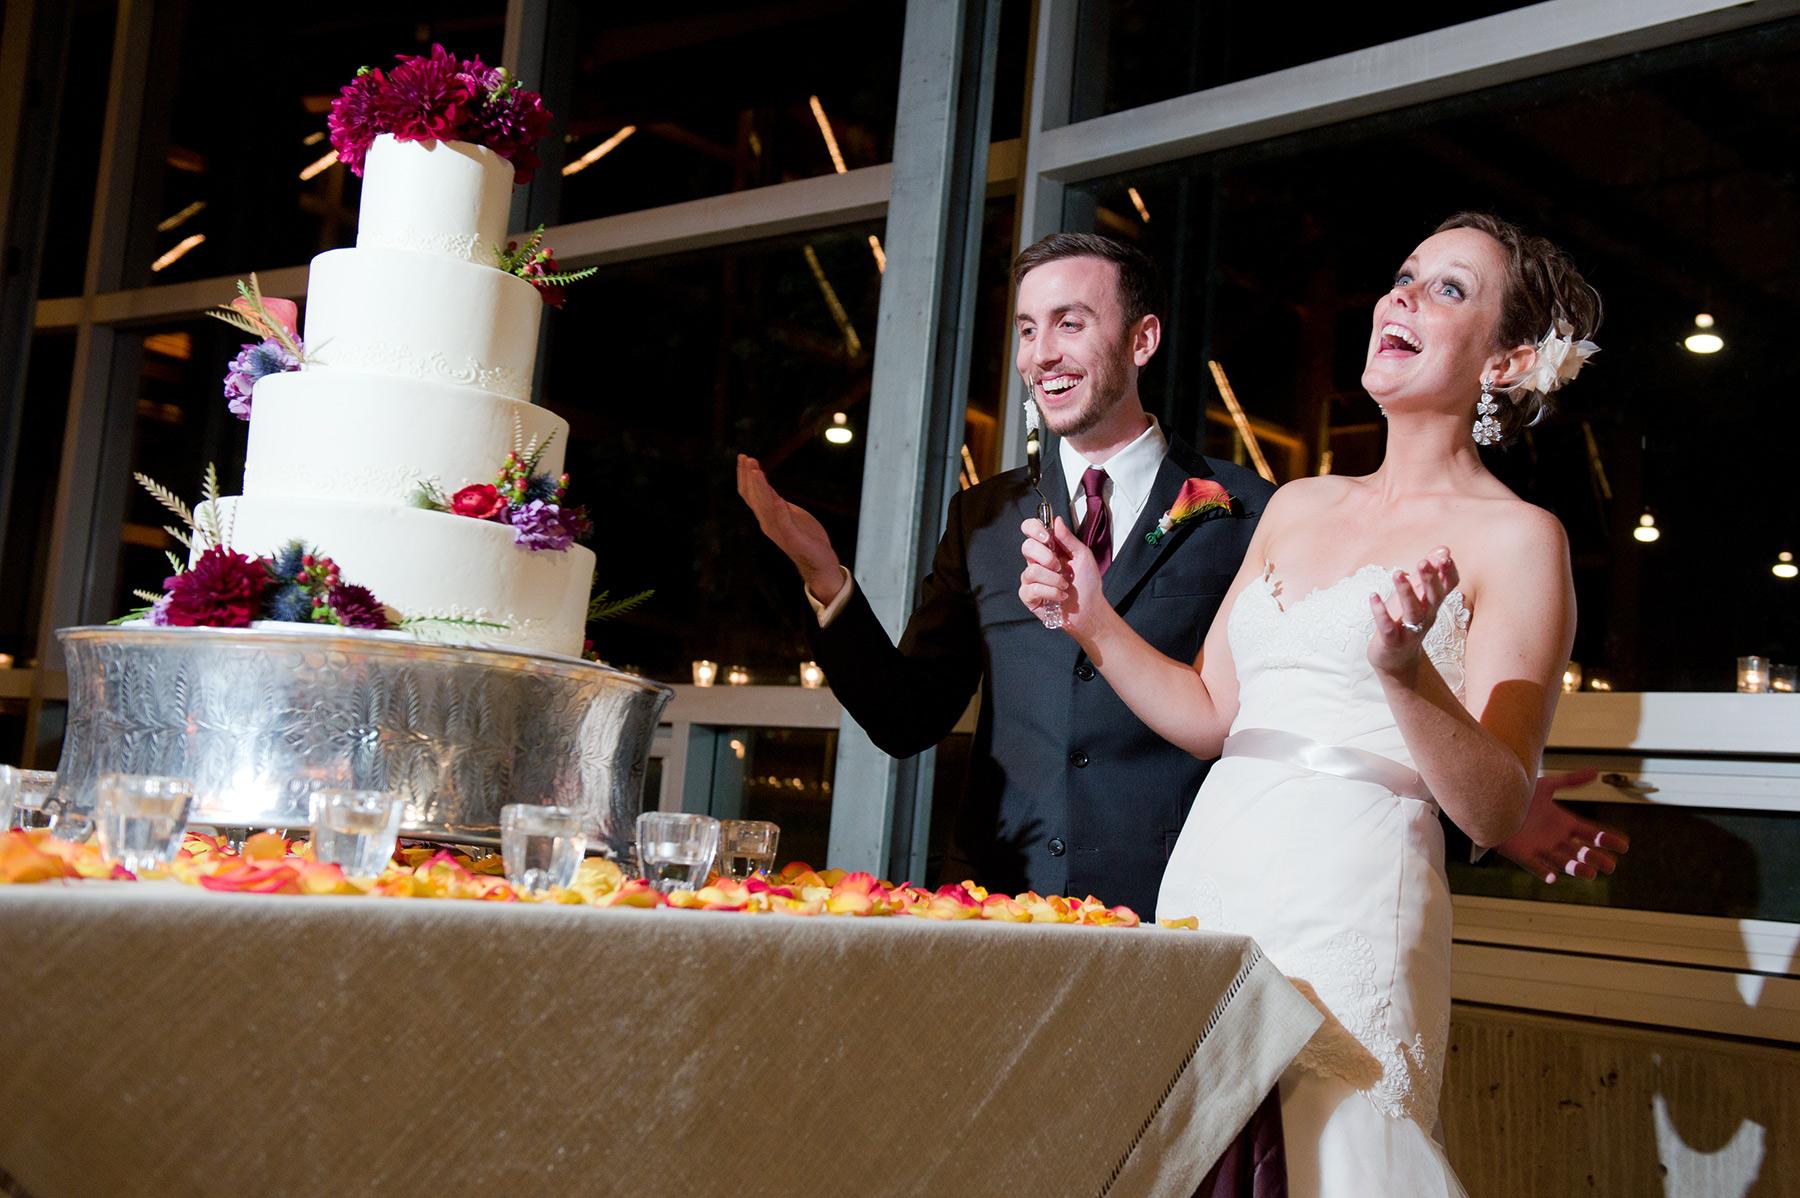 wedding-photography-saint-paul-mark-kegans-651.jpg